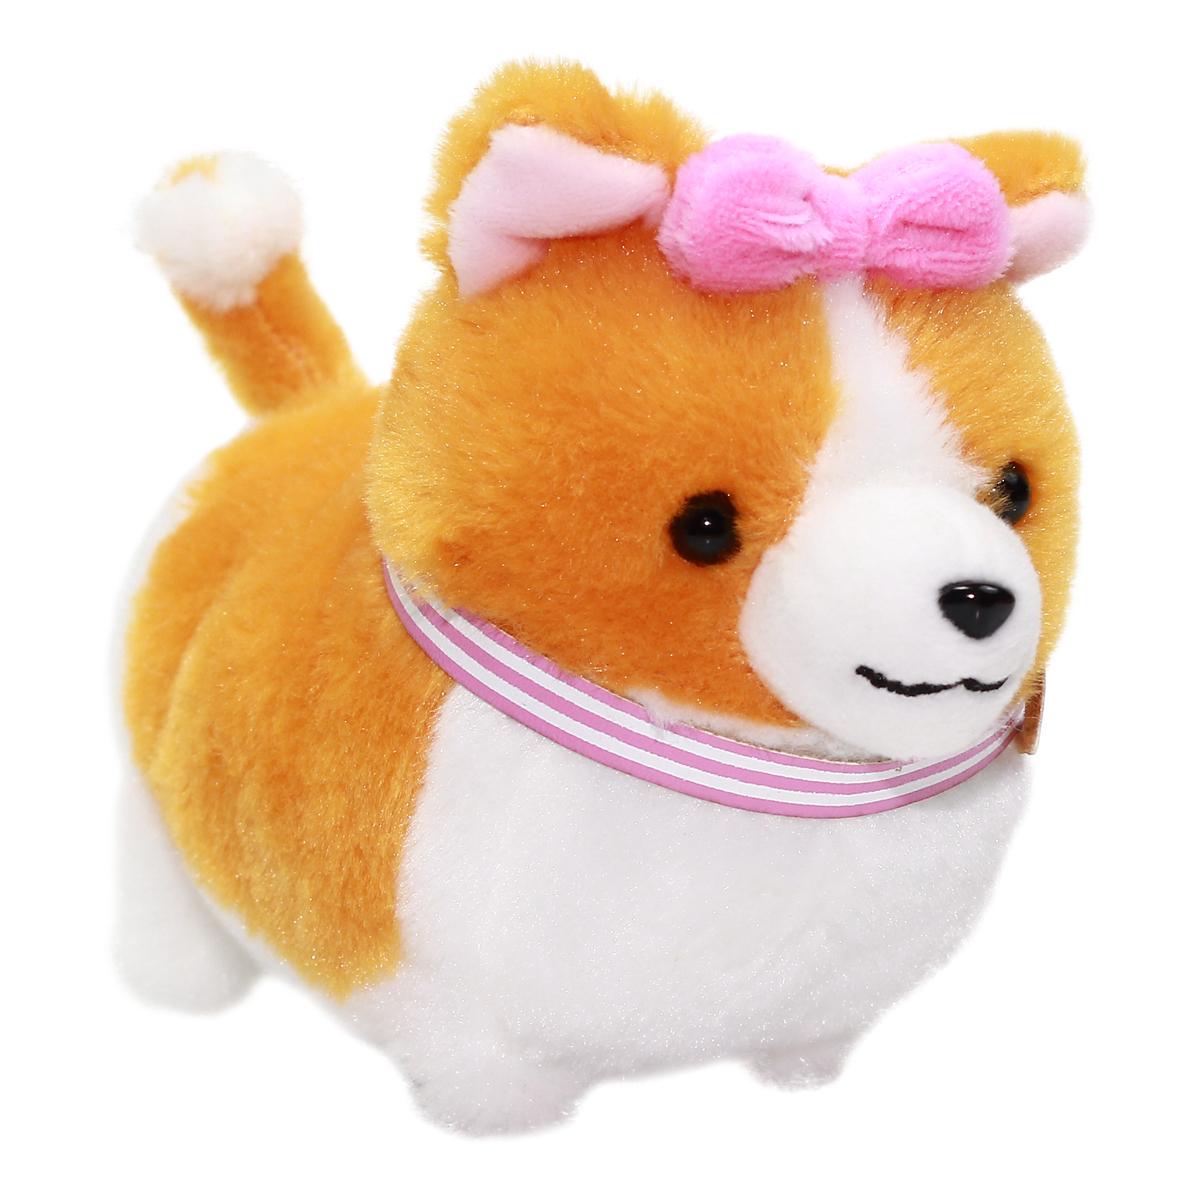 Amuse Ichi Ni no Girl Corgi Plush Small Dog Keychain Orange Pink Collar 4 Inches